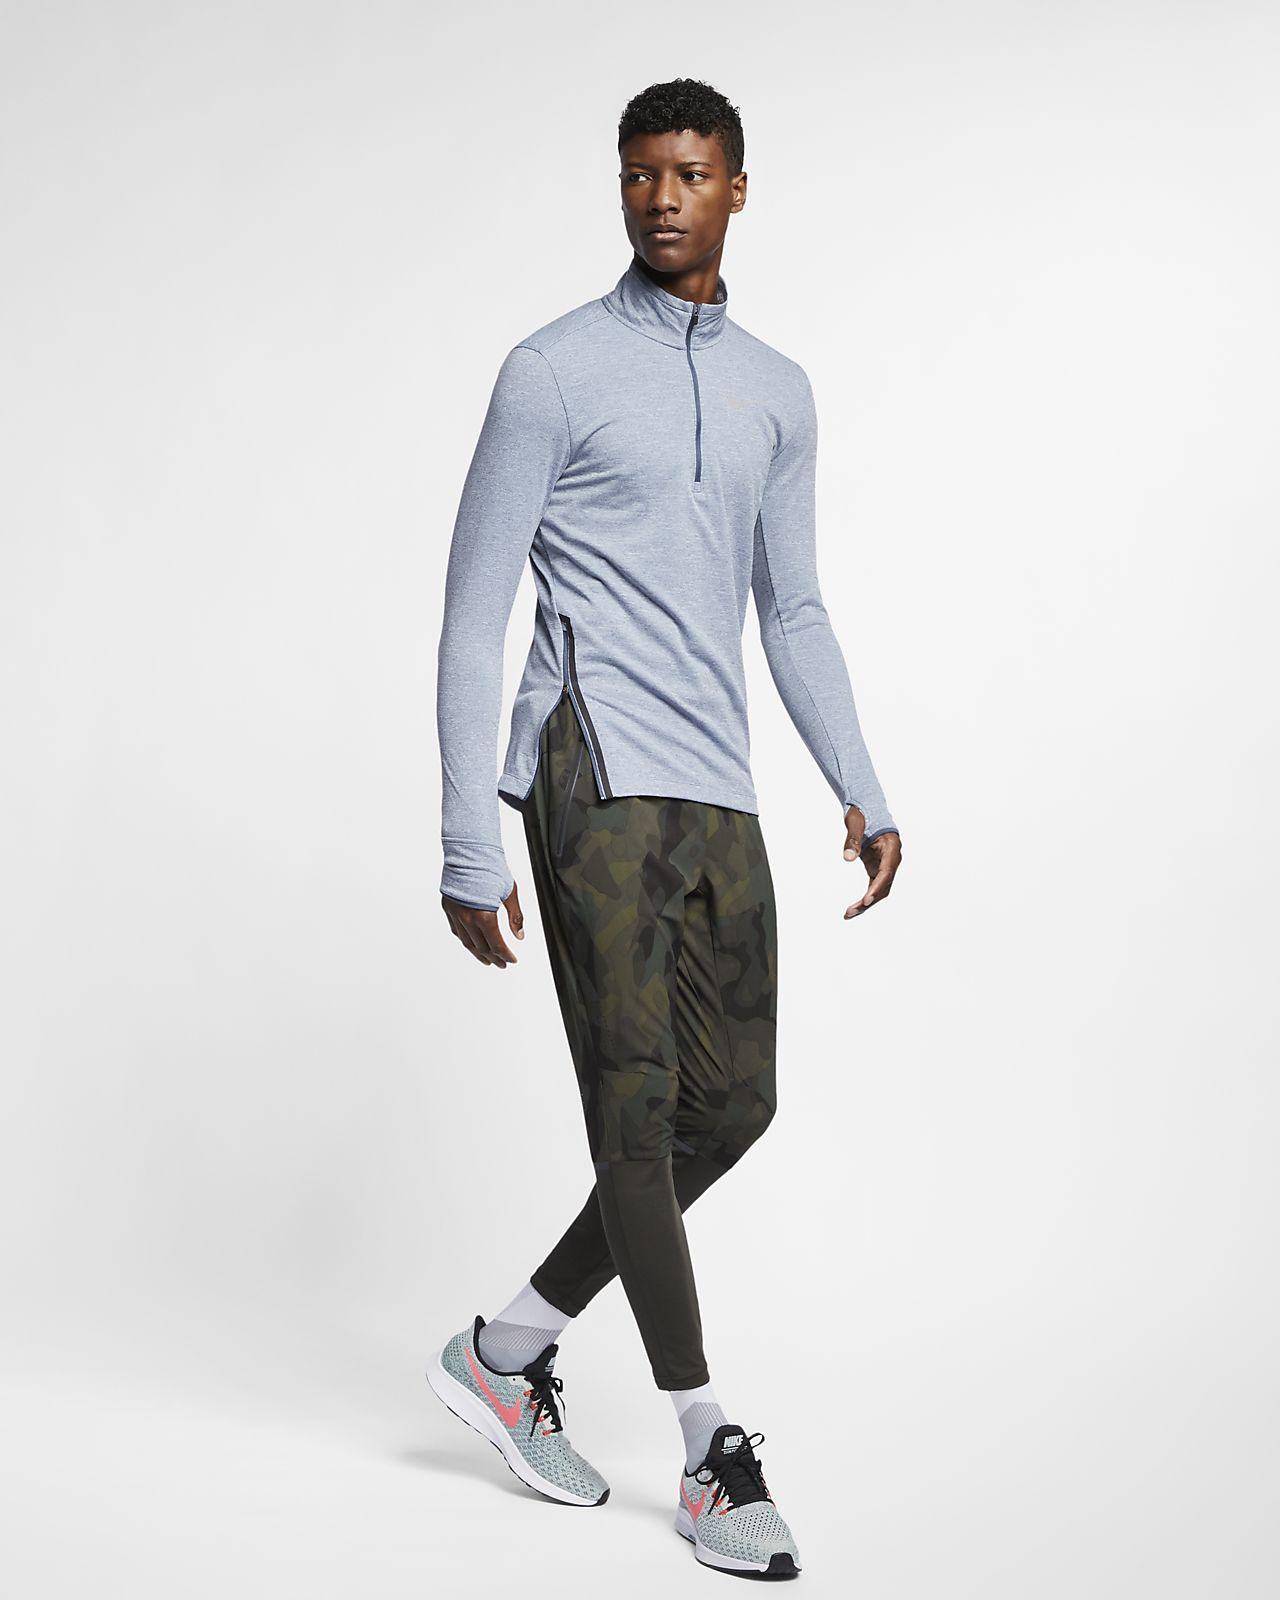 16b6a900 Nike Therma Sphere Element Men's 1/2-Zip Running Top. Nike.com